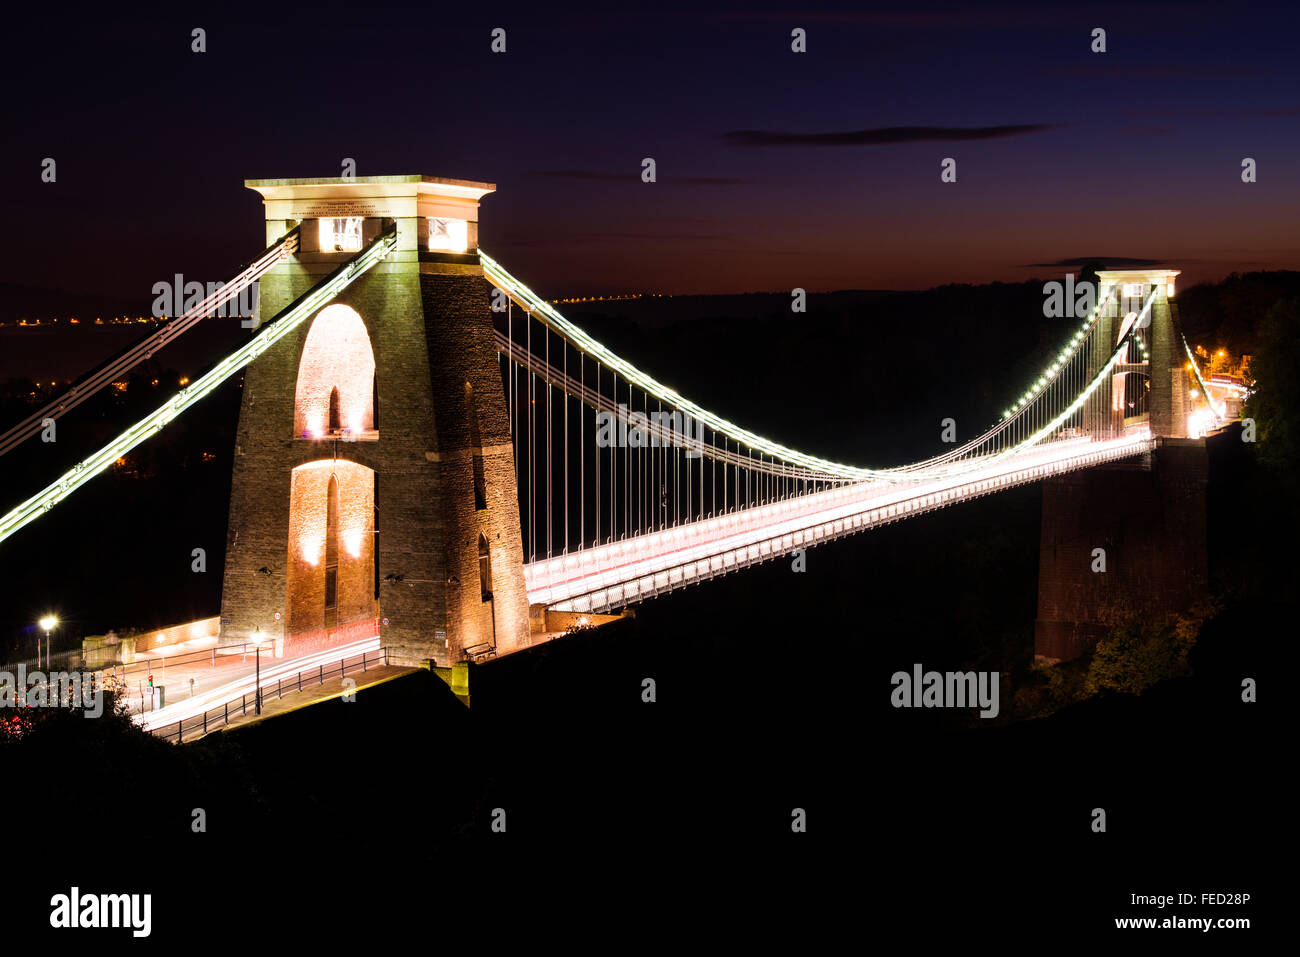 Clifton Suspension Bridge, spanning the Avon Gorge and the River Avon, Bristol, UK - Stock Image